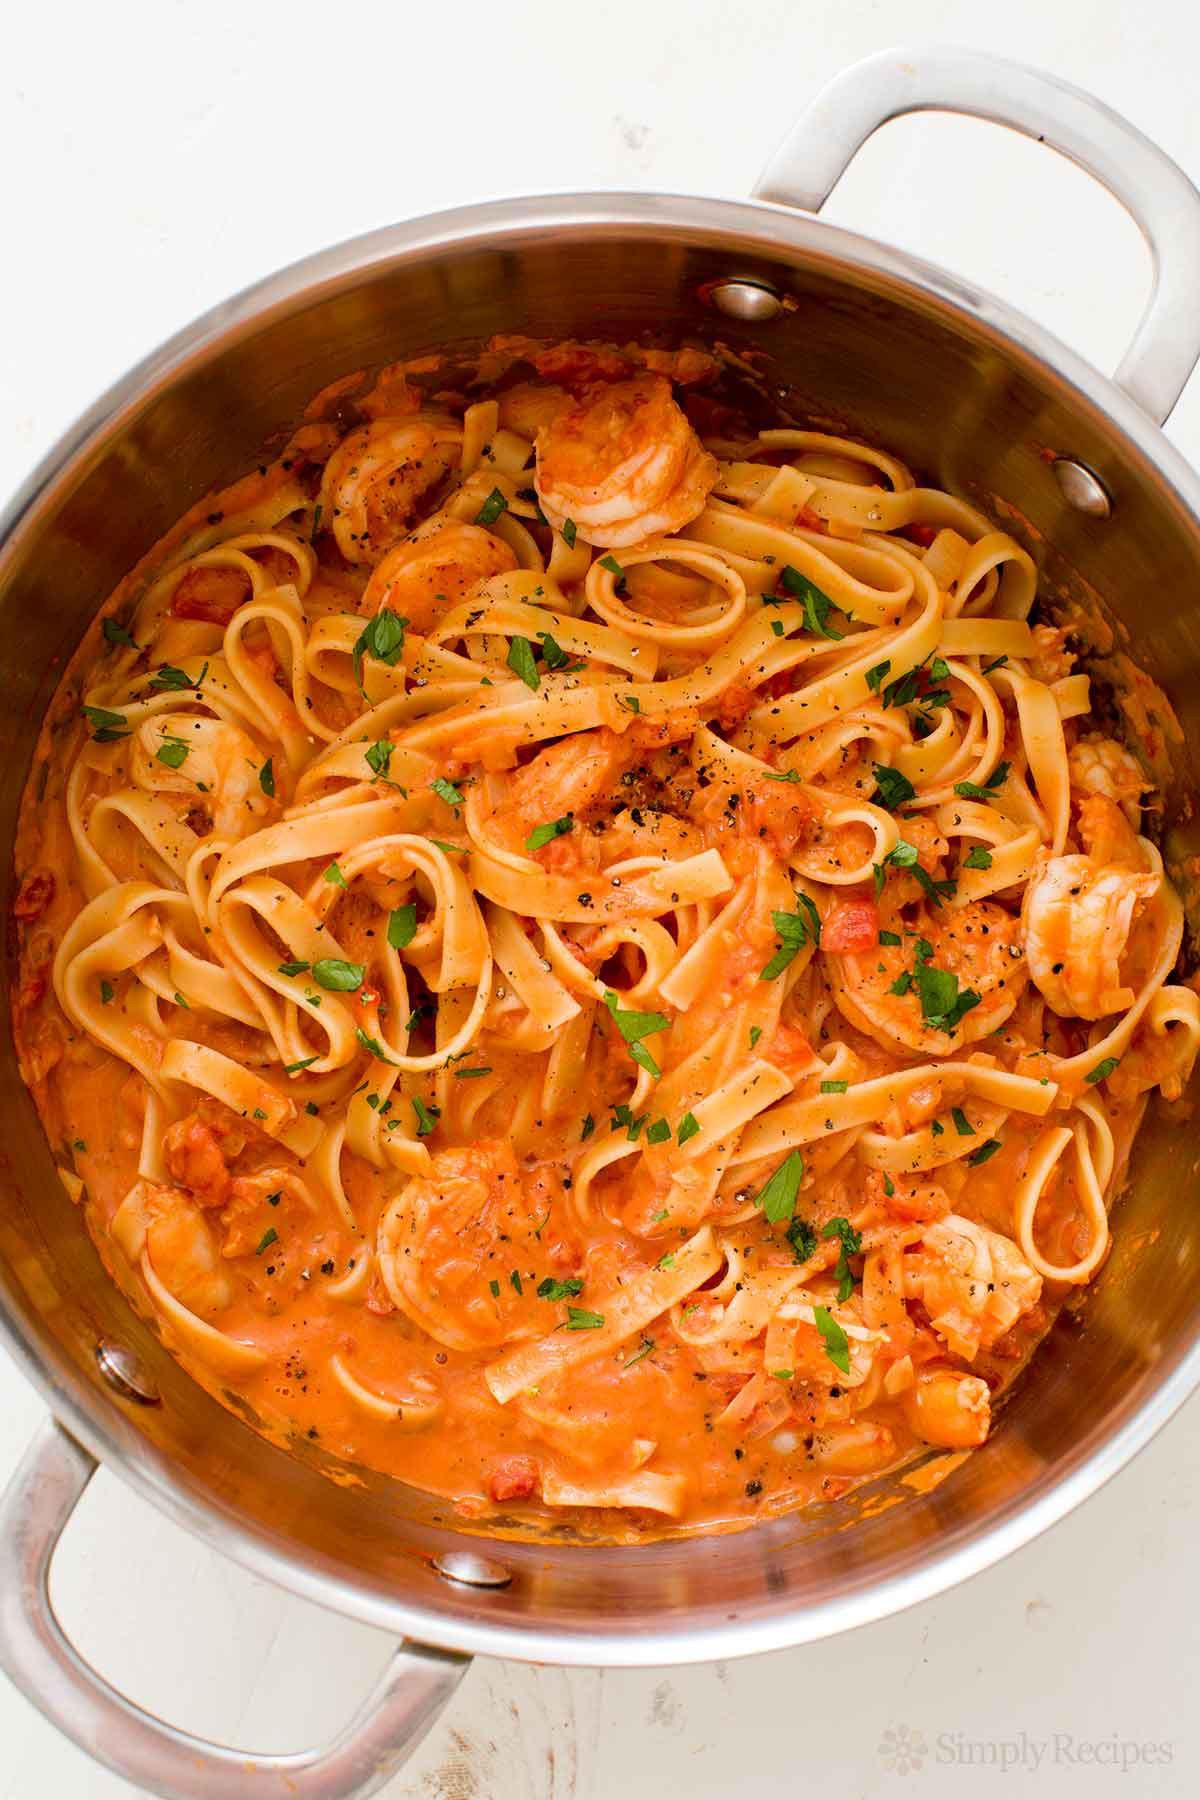 Shrimp And Pasta Dishes  Shrimp Pasta alla Vodka Recipe with video